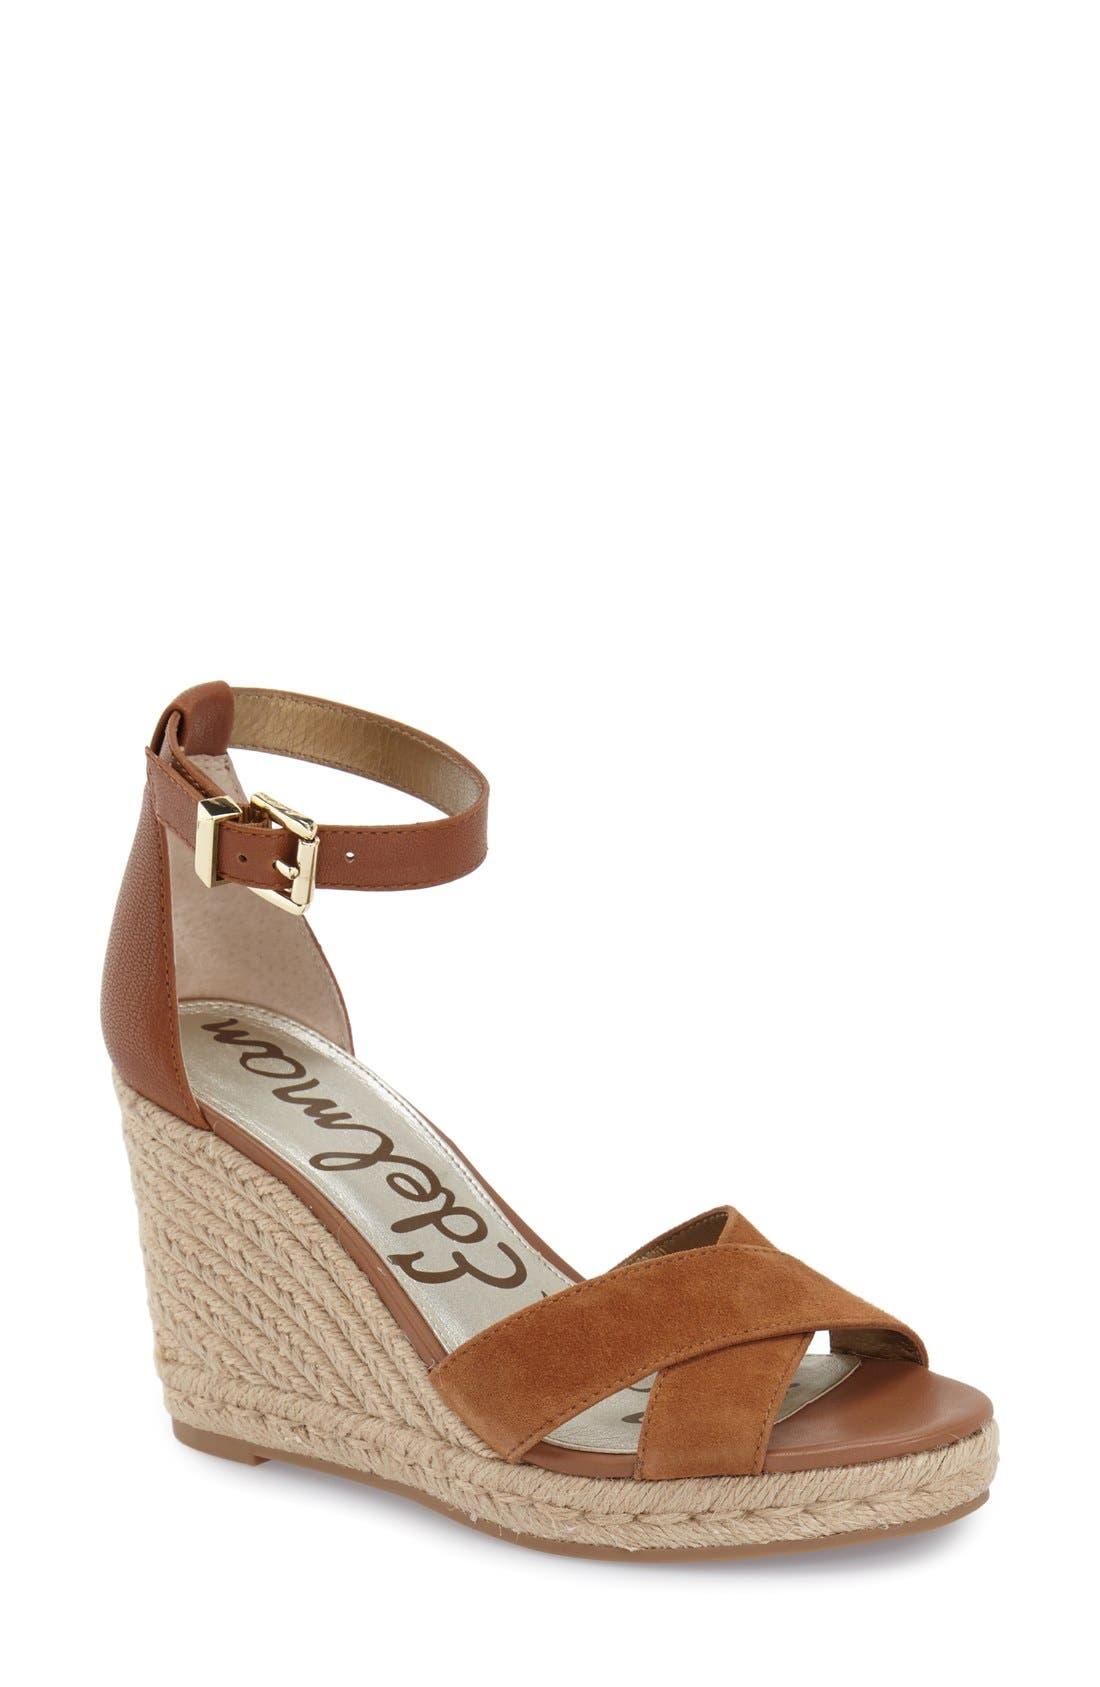 'Brenda' Espadrille Wedge Sandal,                         Main,                         color, Saddle